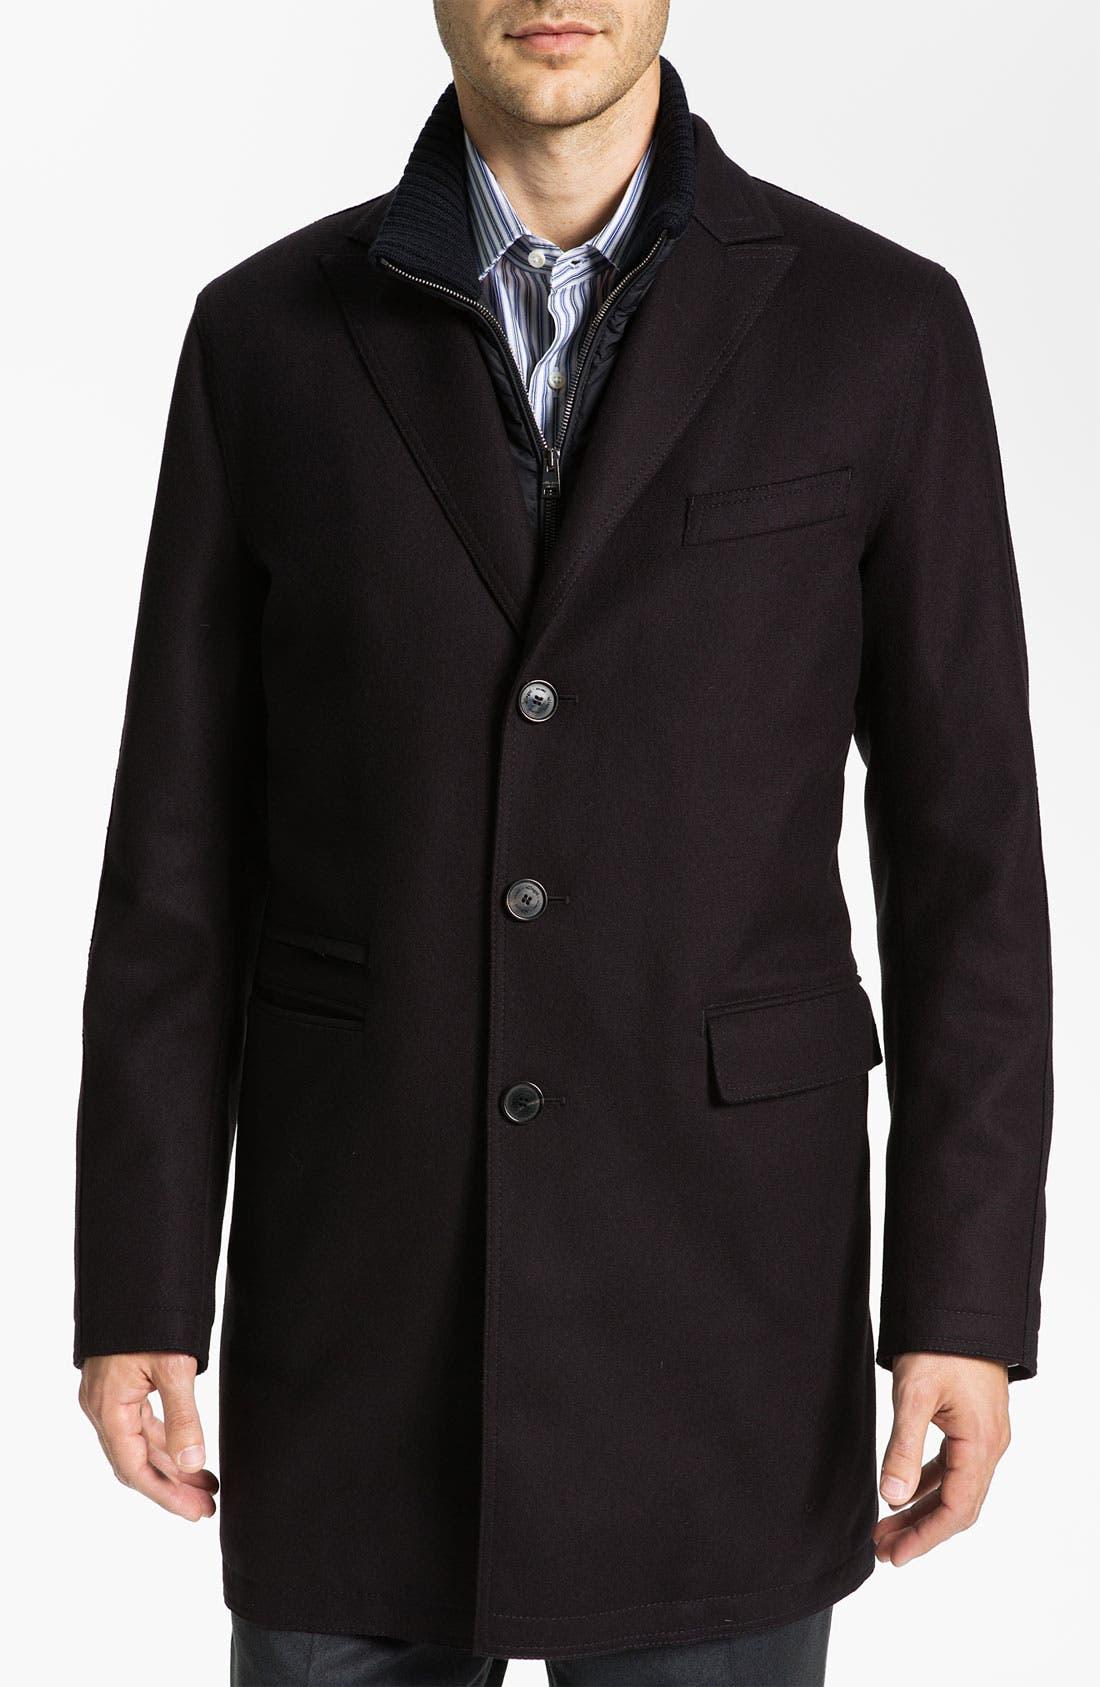 Main Image - Allegri 'Techno' Water Resistant Top Coat